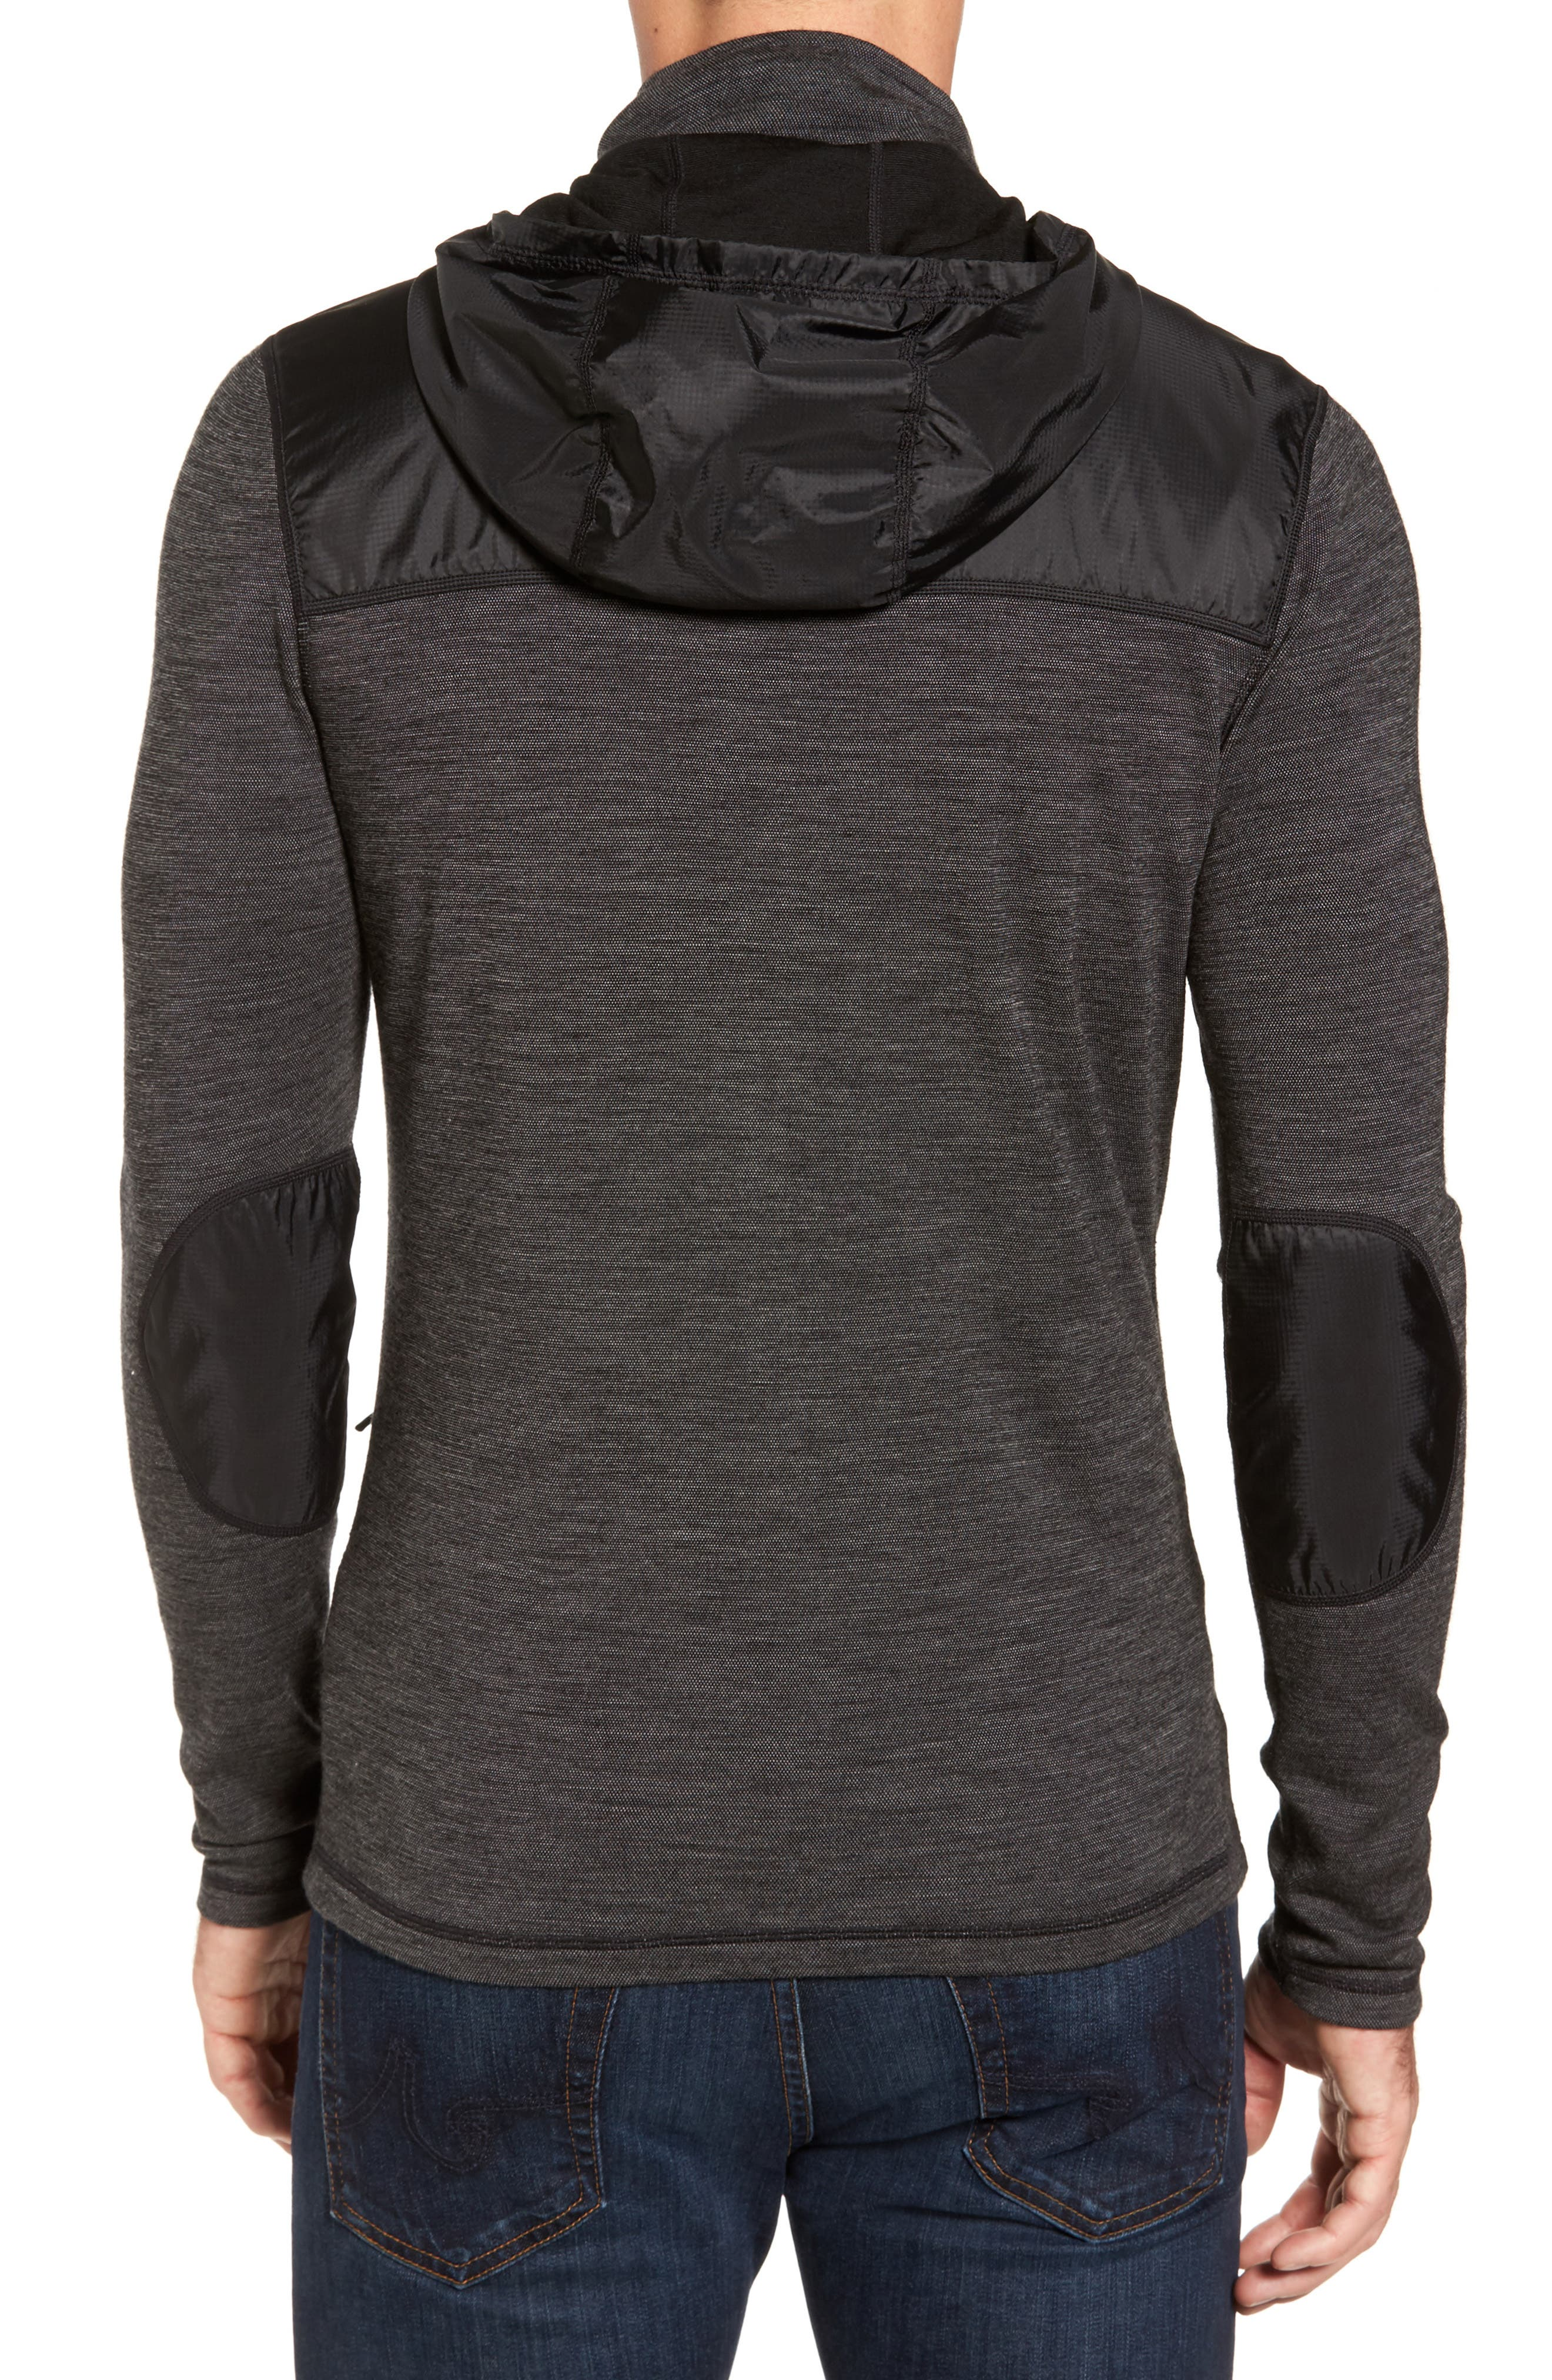 250 Sport Merino Wool Jacket,                             Alternate thumbnail 2, color,                             Black